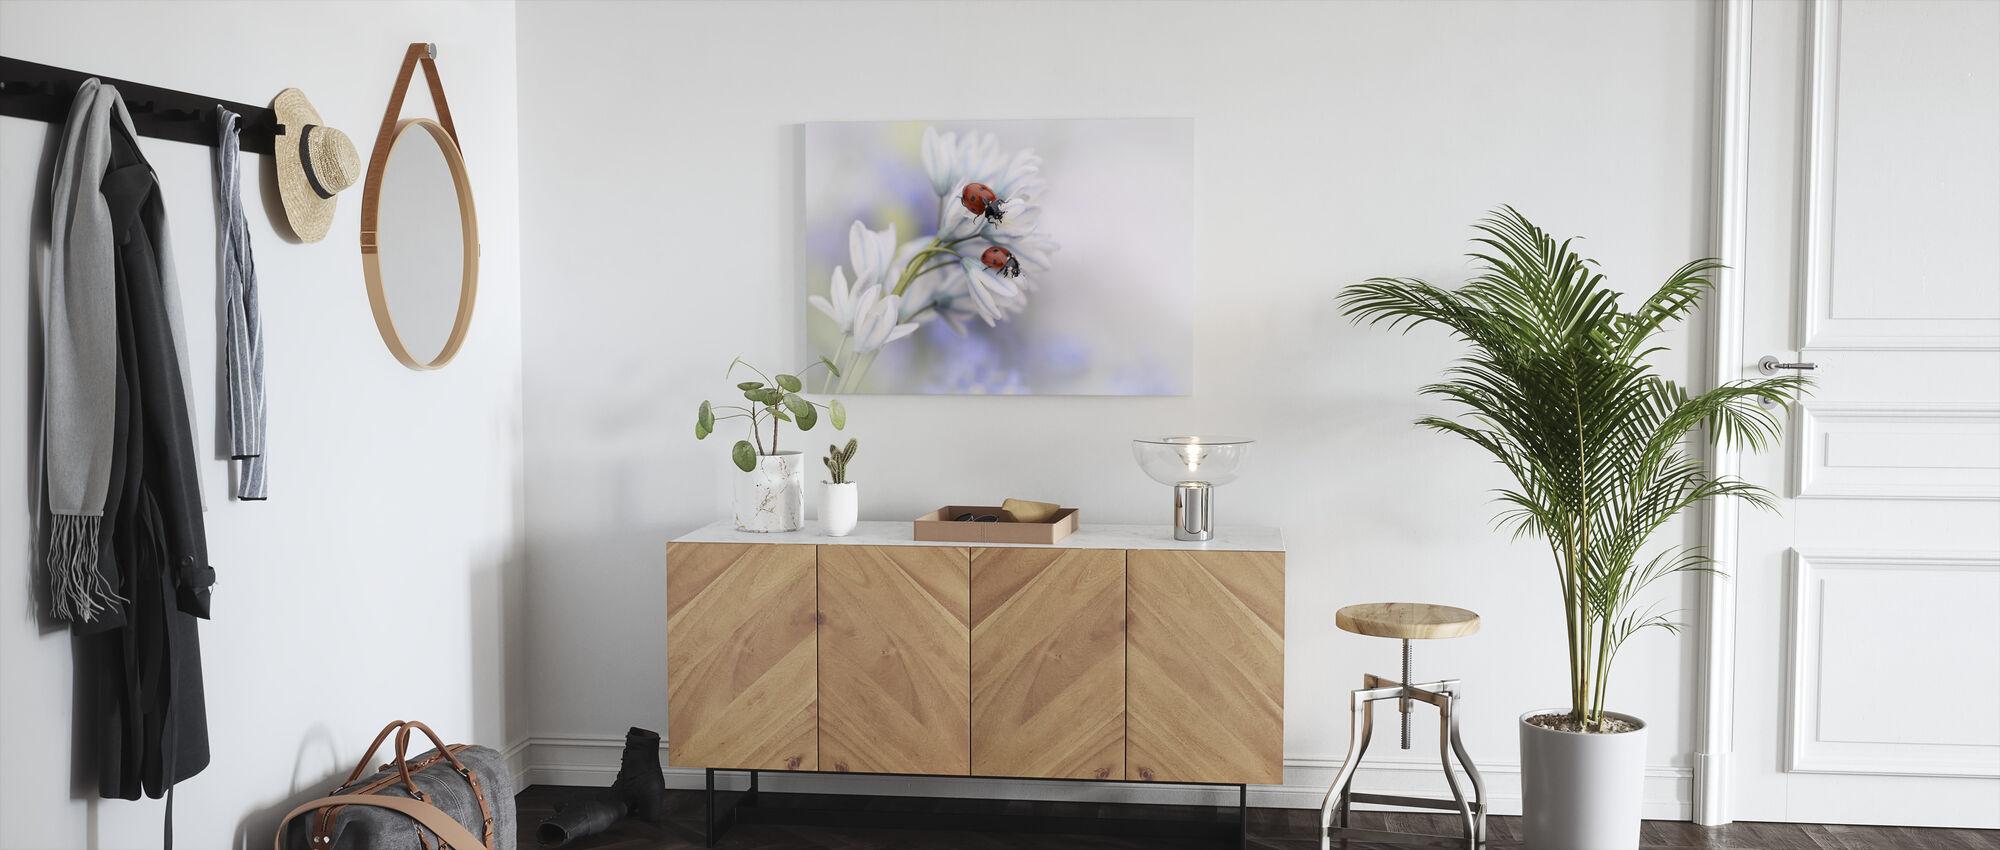 Ladybugs on White Flower - Canvas print - Hallway